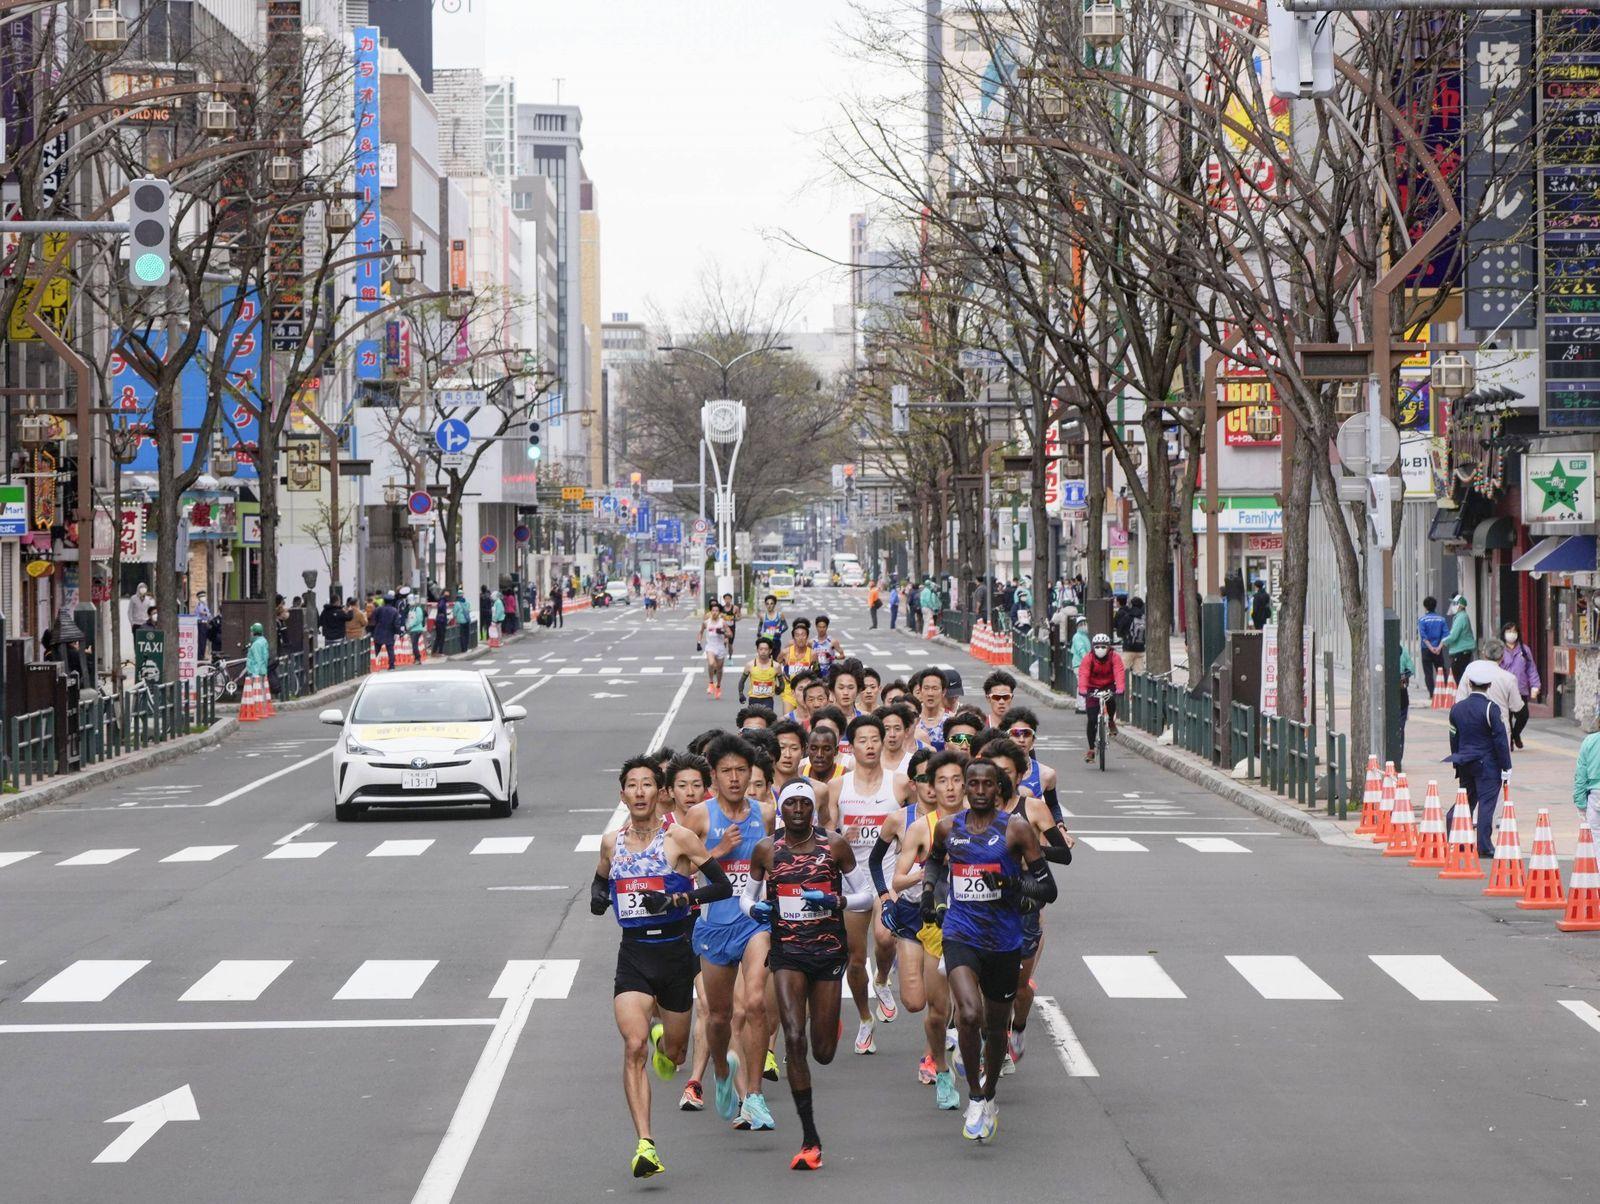 Athletics: Olympic marathon test event A half-marathon race for men is held amid the coronavirus pandemic at the venue o